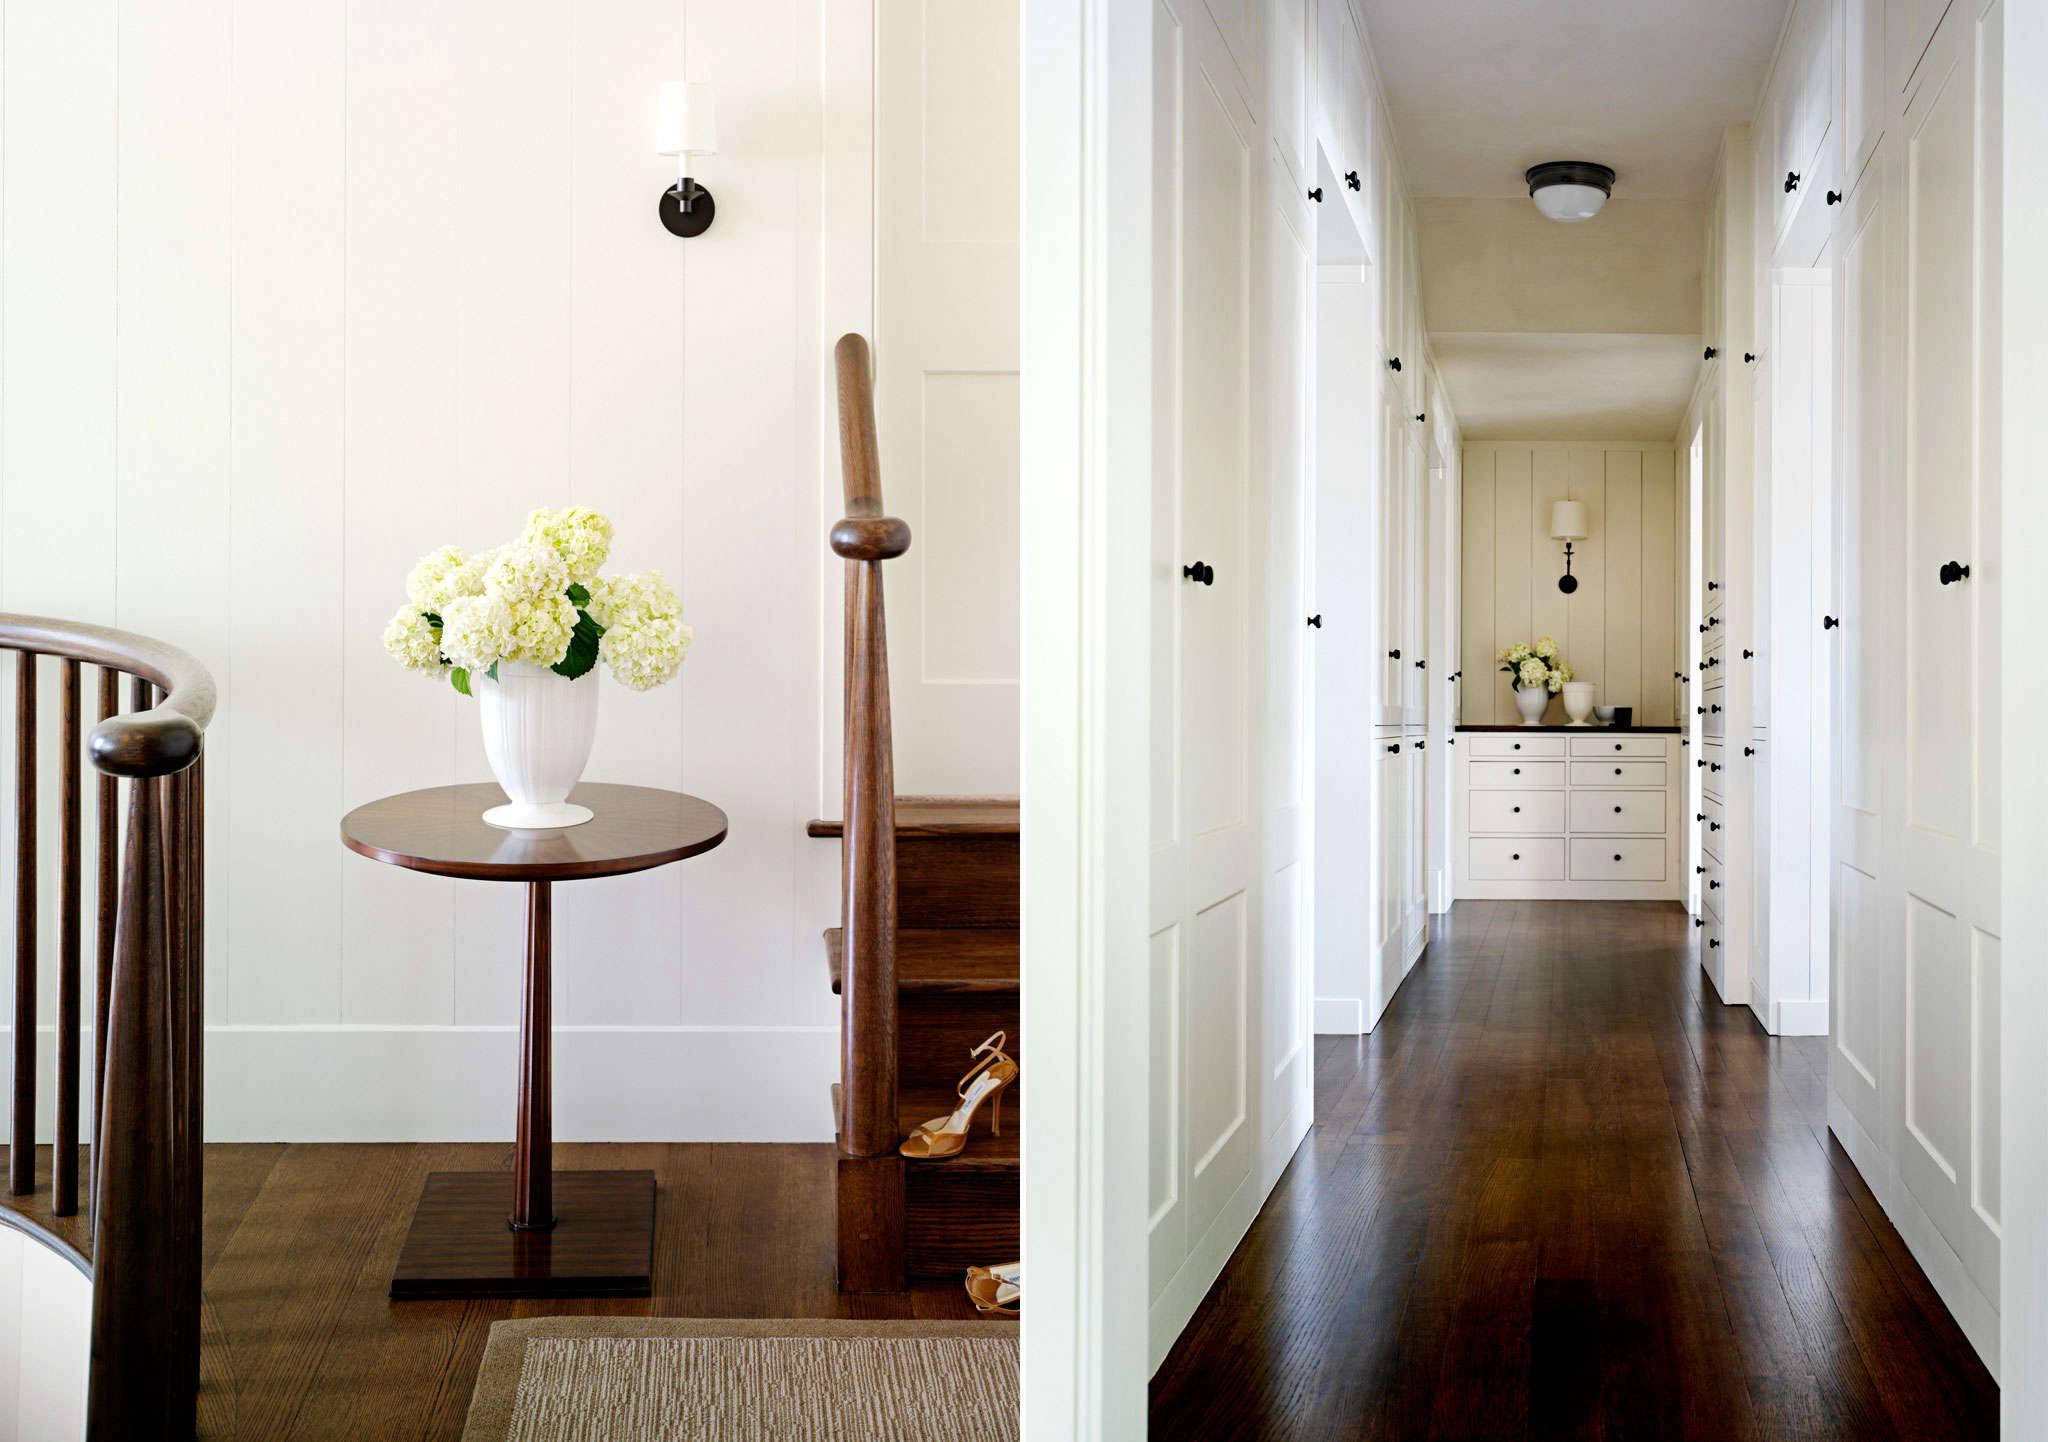 barbara barry design in jackson hole, wyoming |remodelista 10